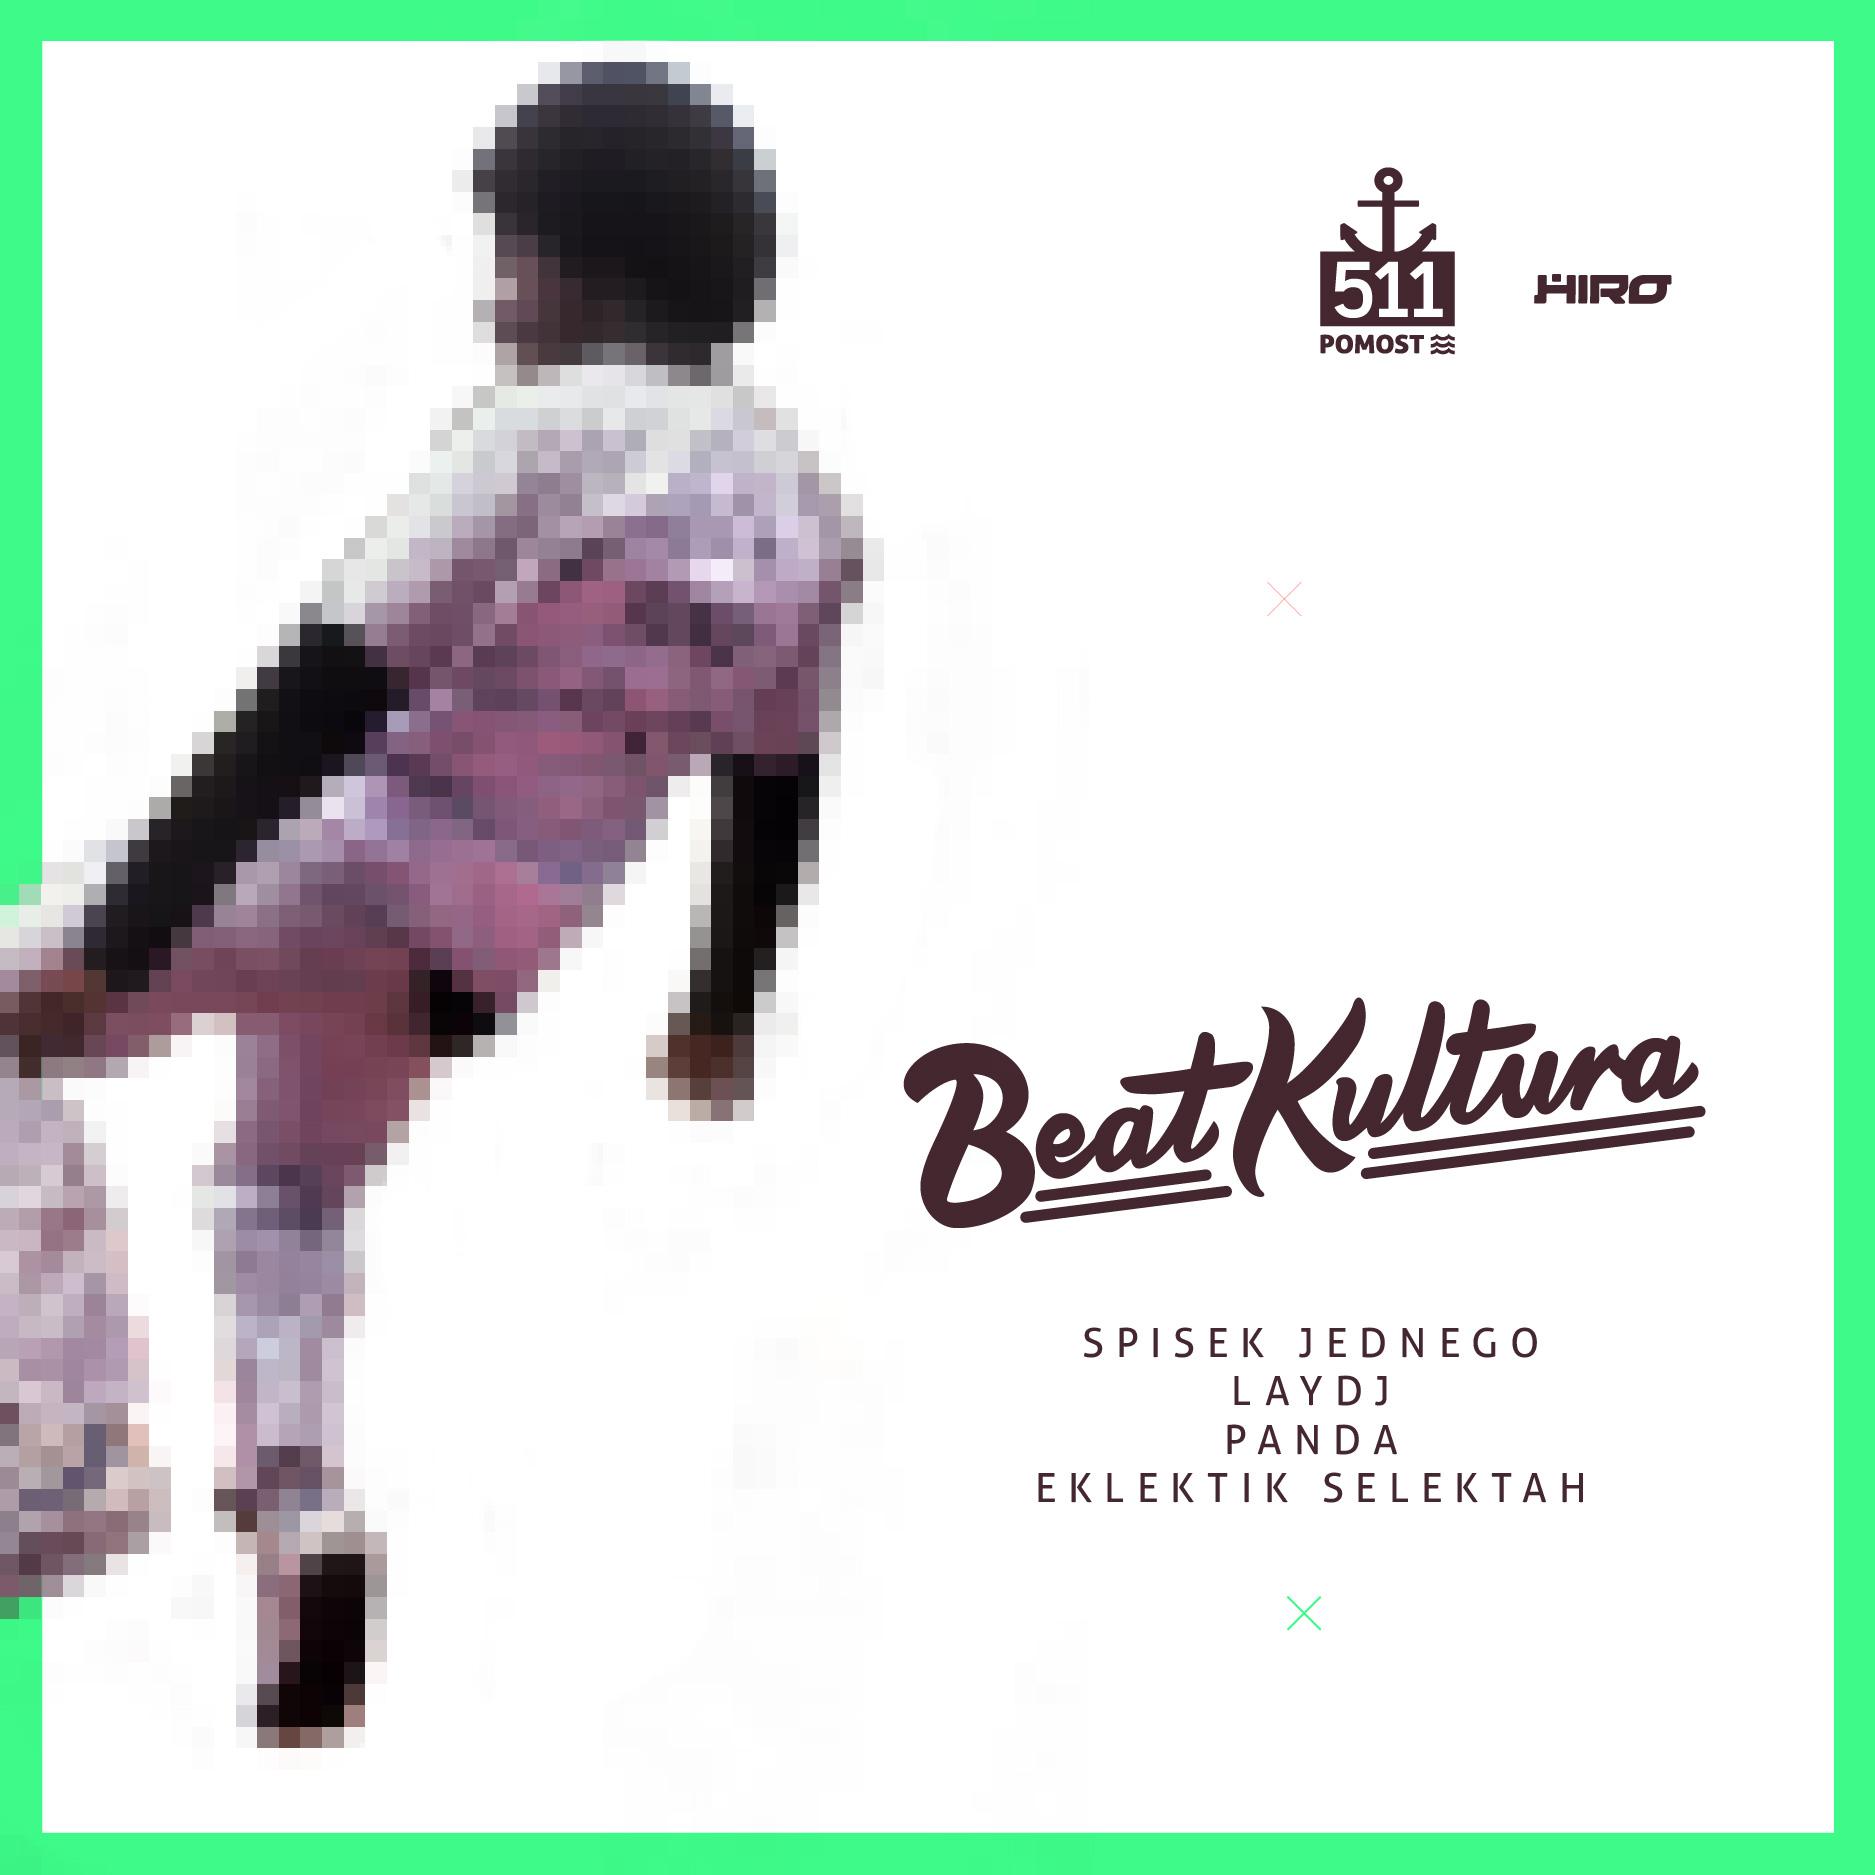 beatkultura_Pomost511_07.08_Insta